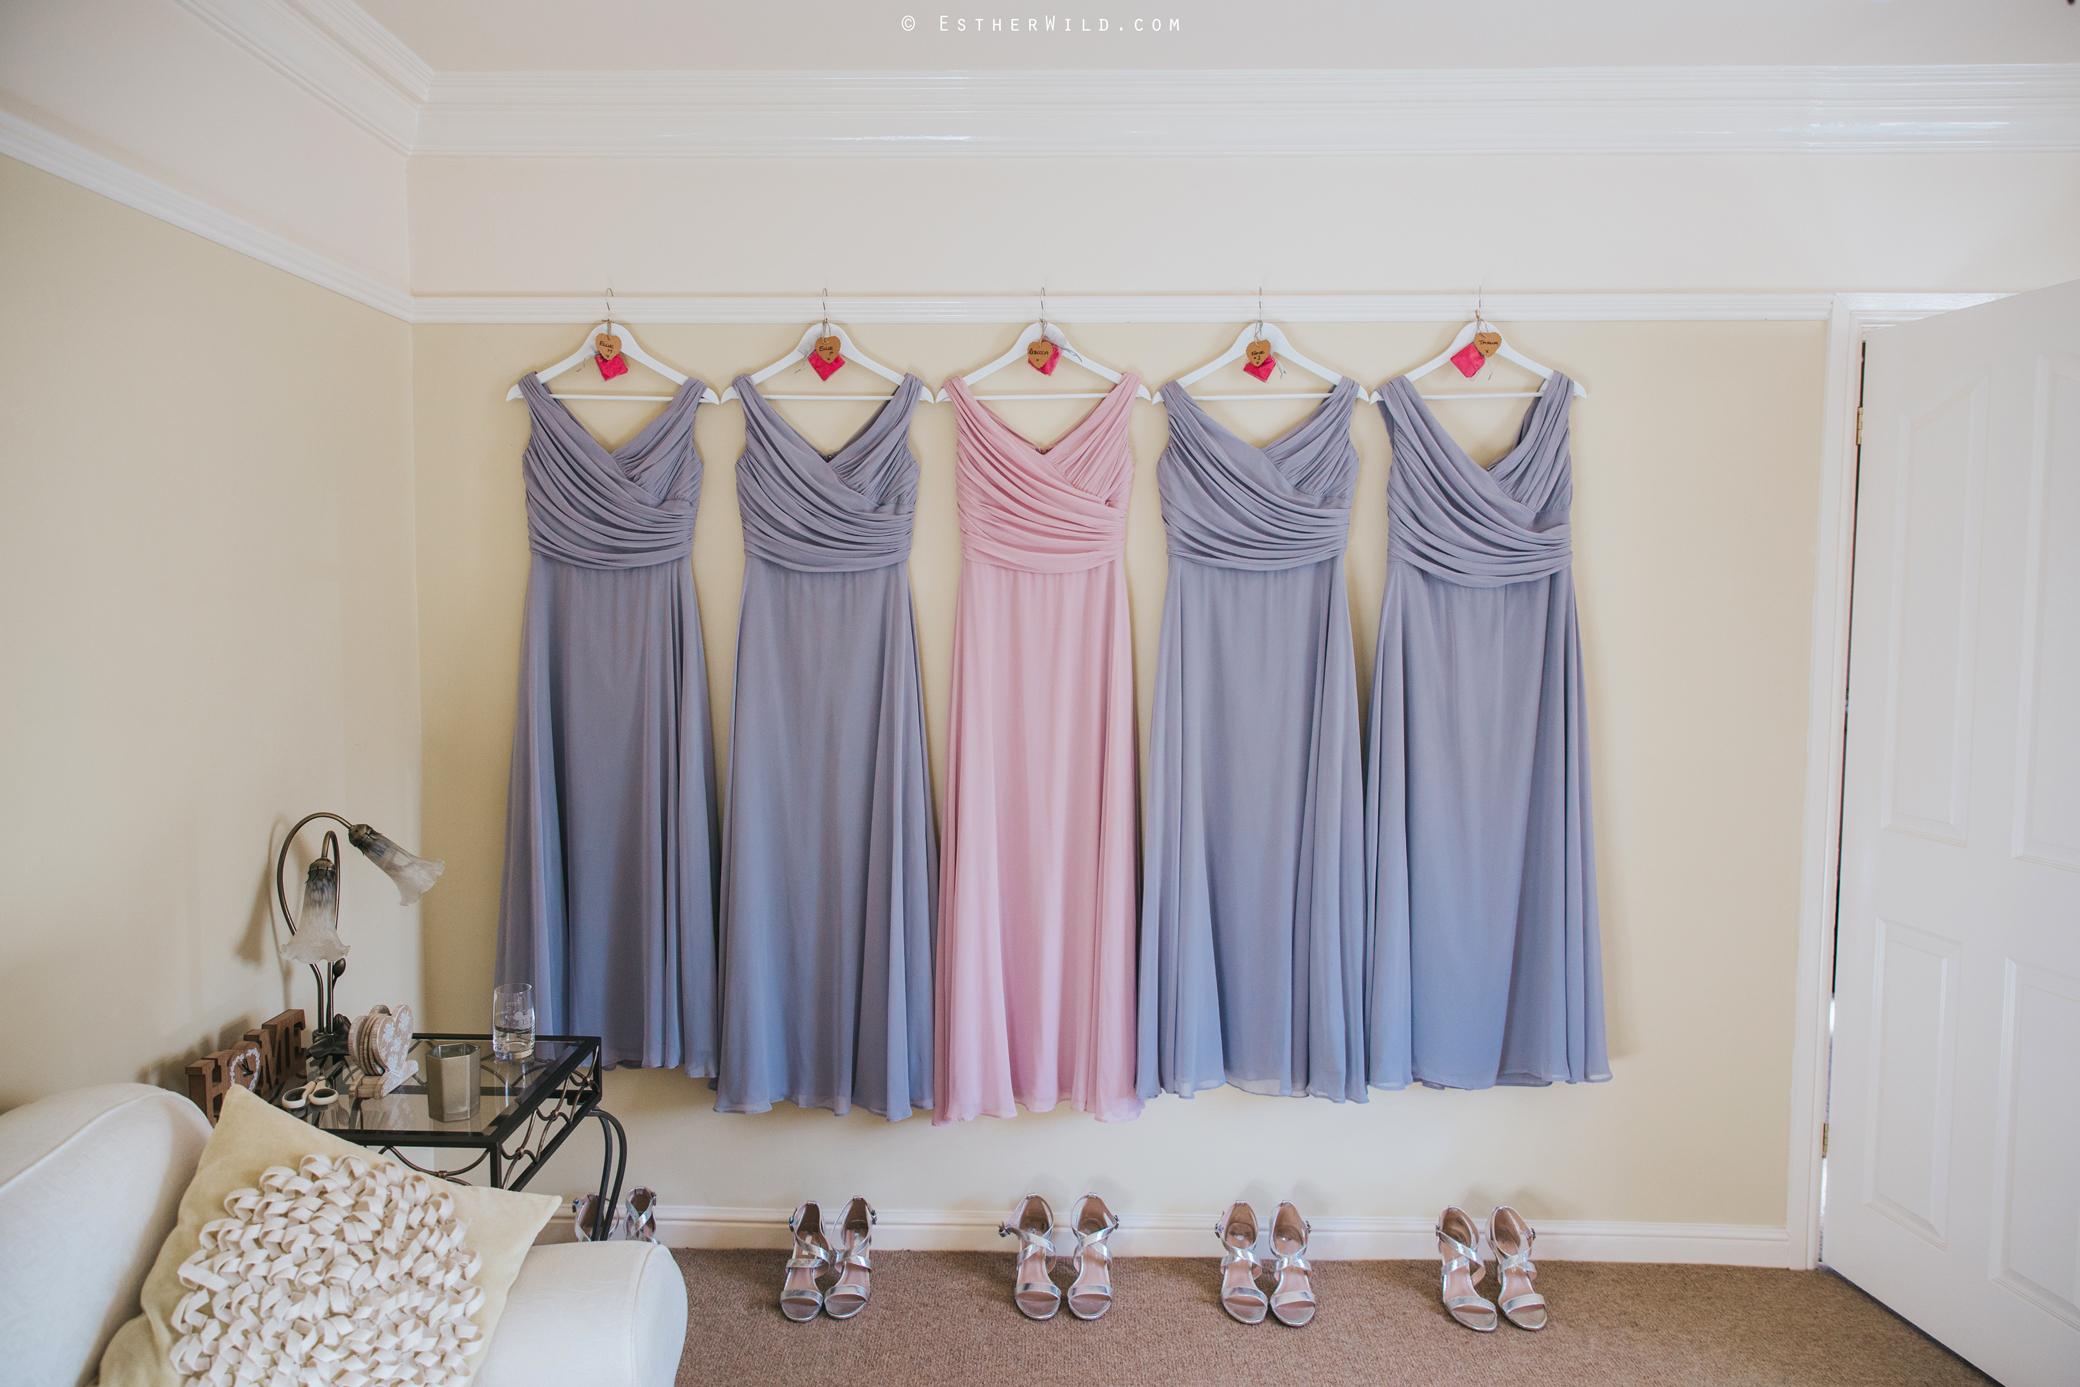 Wedding_Kings_Lynn_Town_Hall_Norfolk_Photographer_Esther_Wild_IMG_0042.jpg